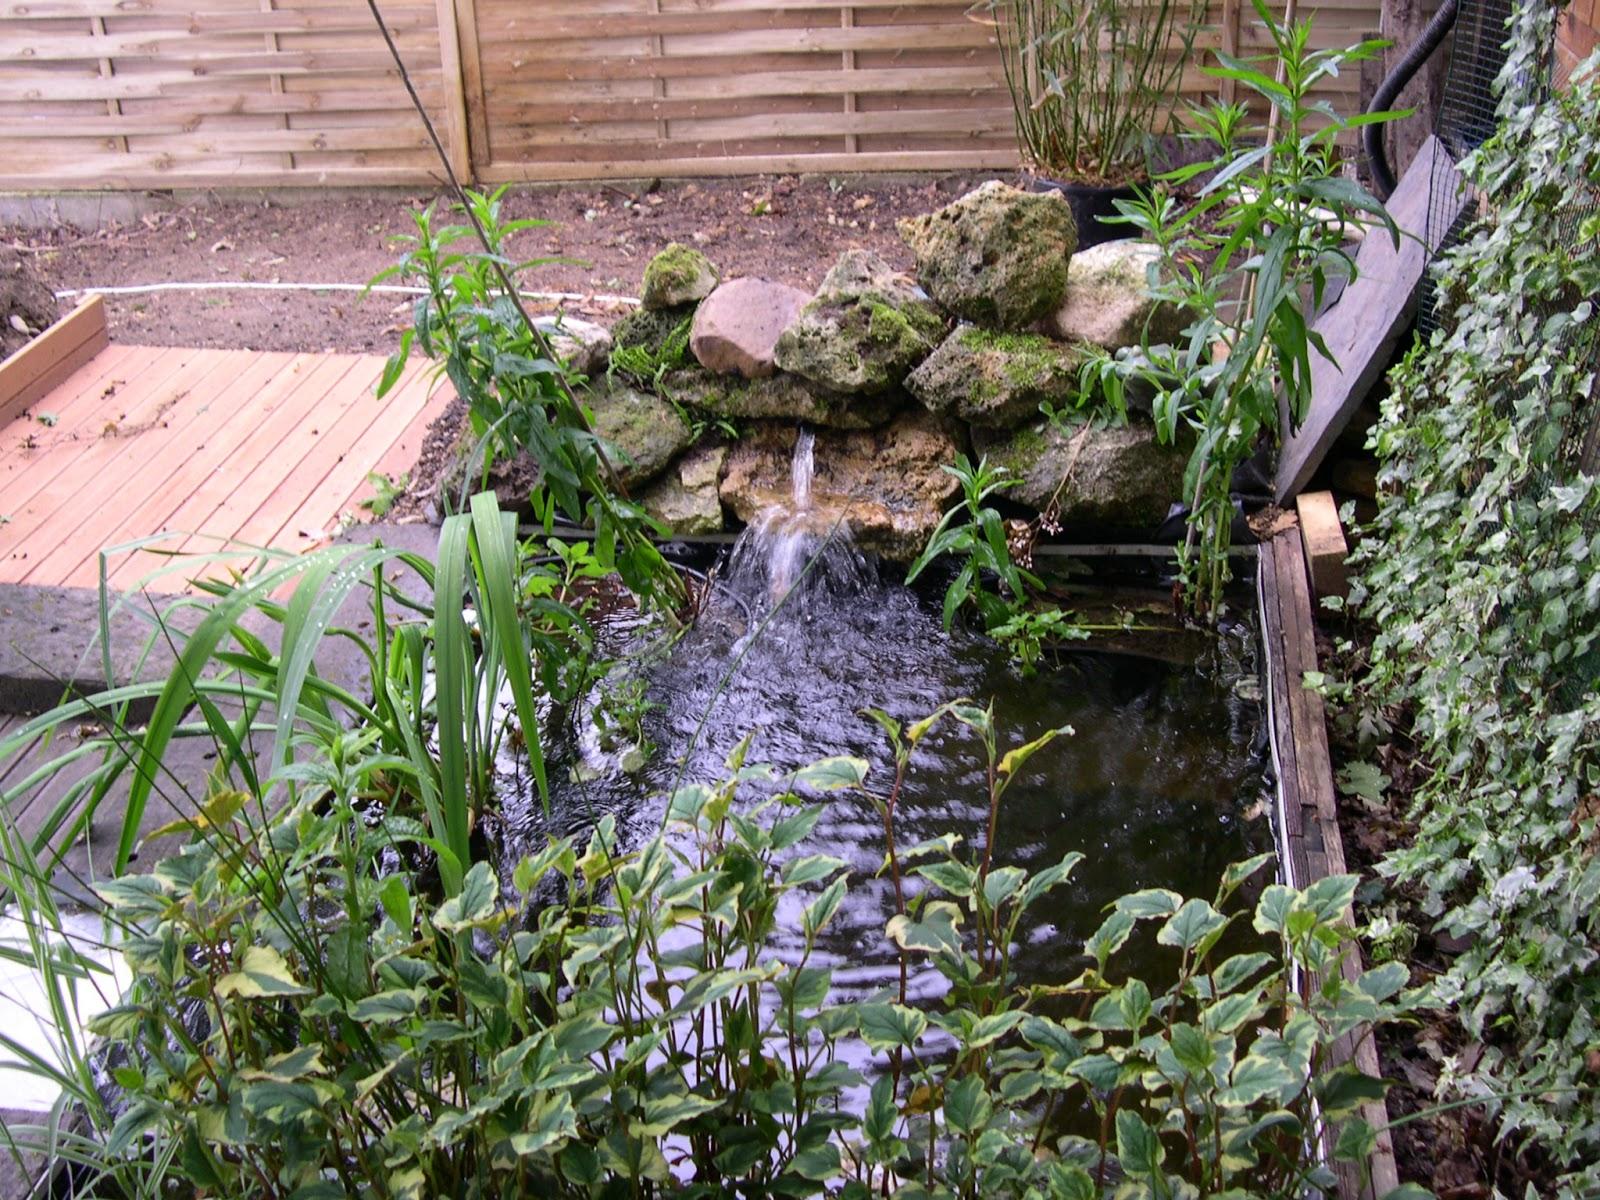 mon petit bassin de jardin construction de la terrasse et du petit bassin. Black Bedroom Furniture Sets. Home Design Ideas